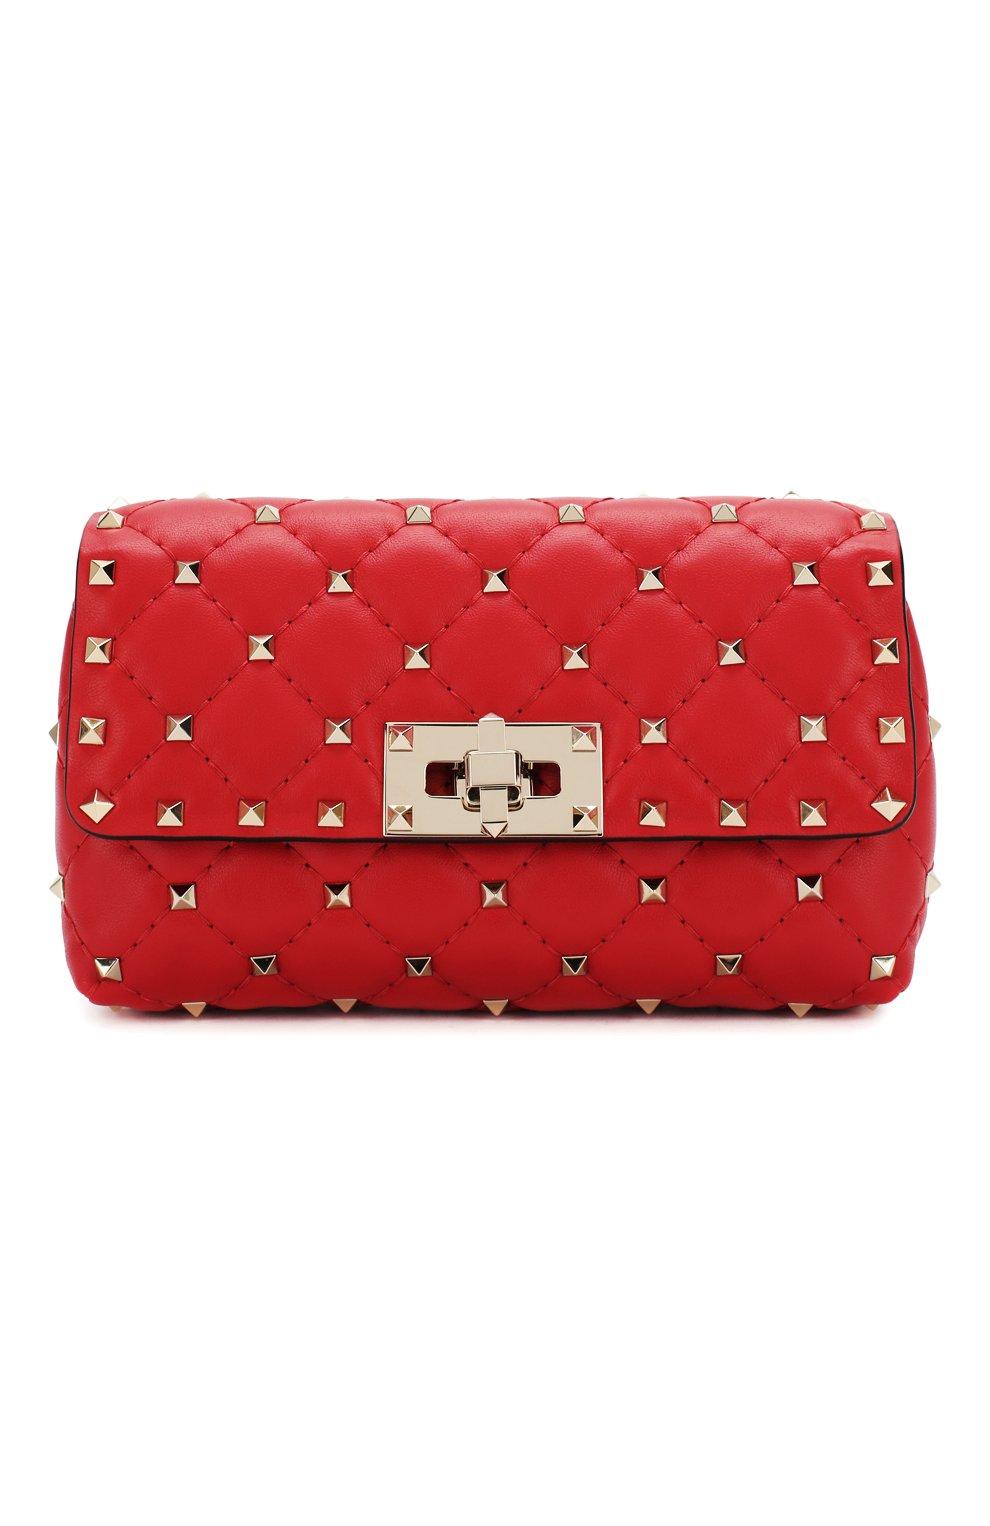 Поясная сумка Valentino Garavani Rockstud Spike small | Фото №1